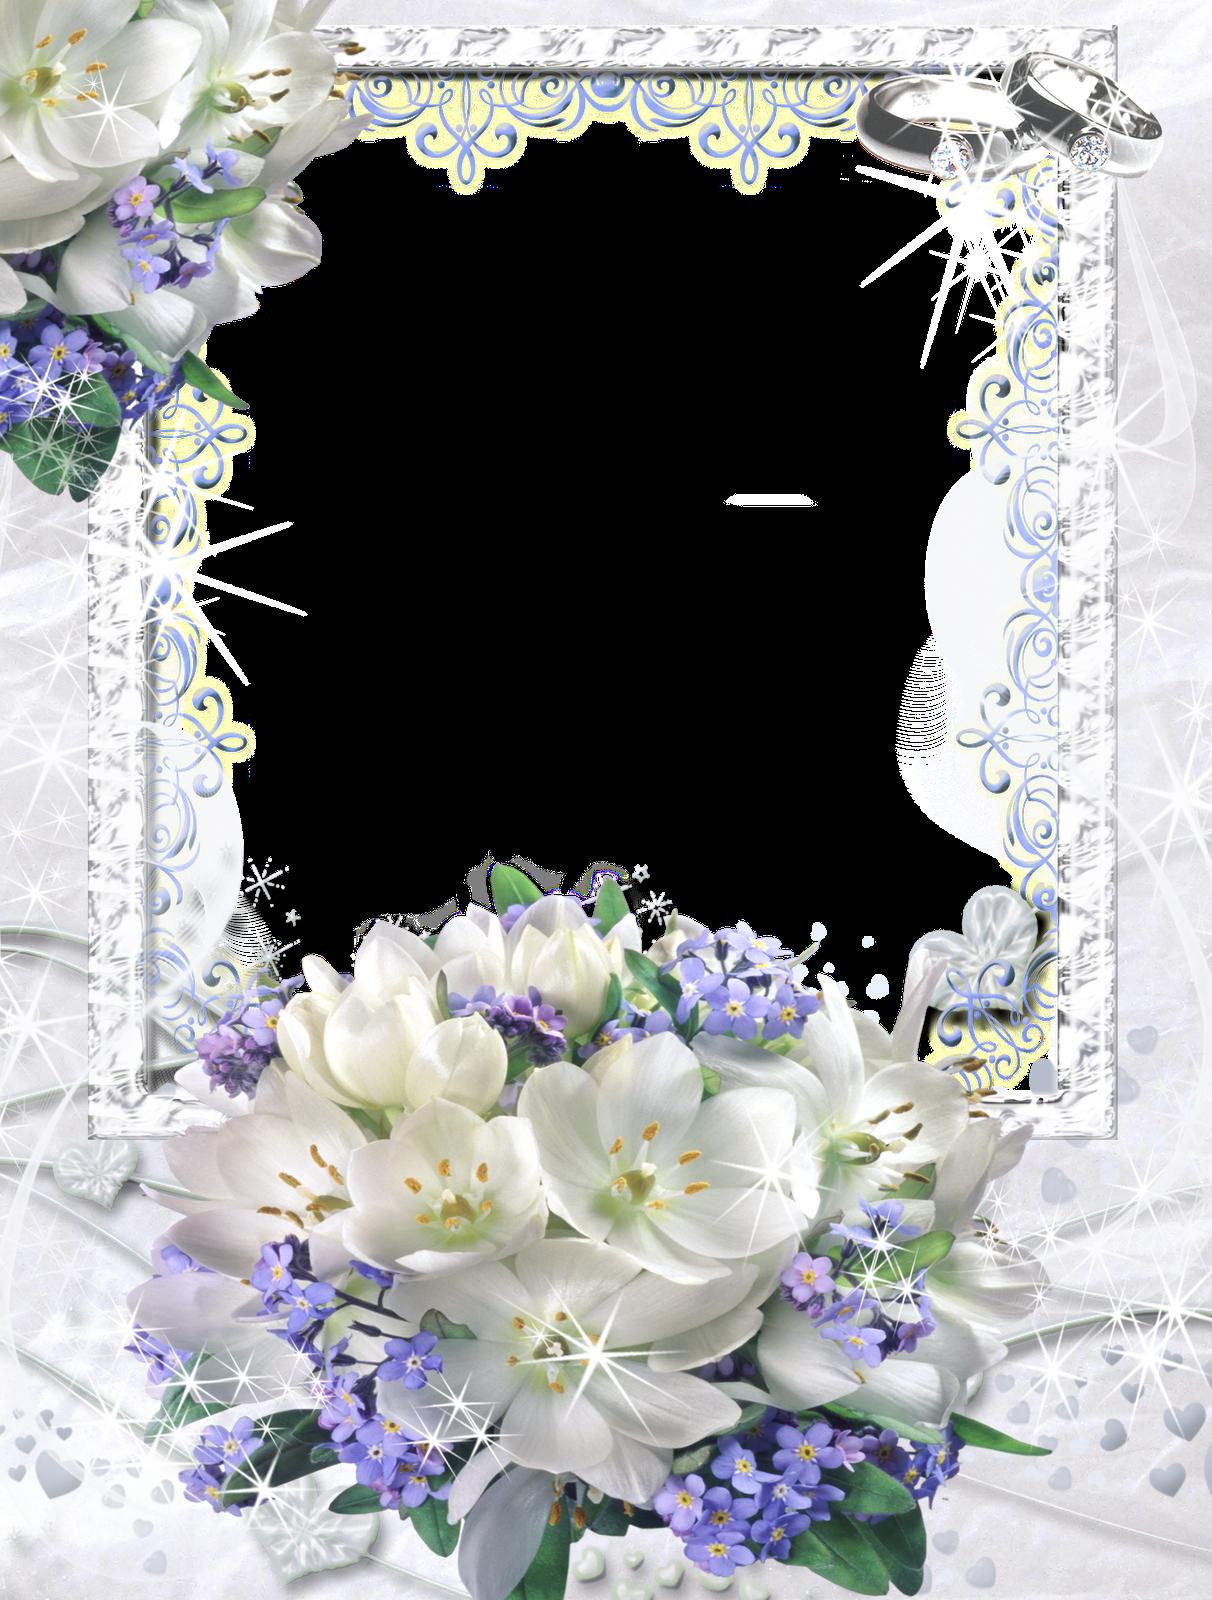 Flower Frame By Umbhra On Deviantart